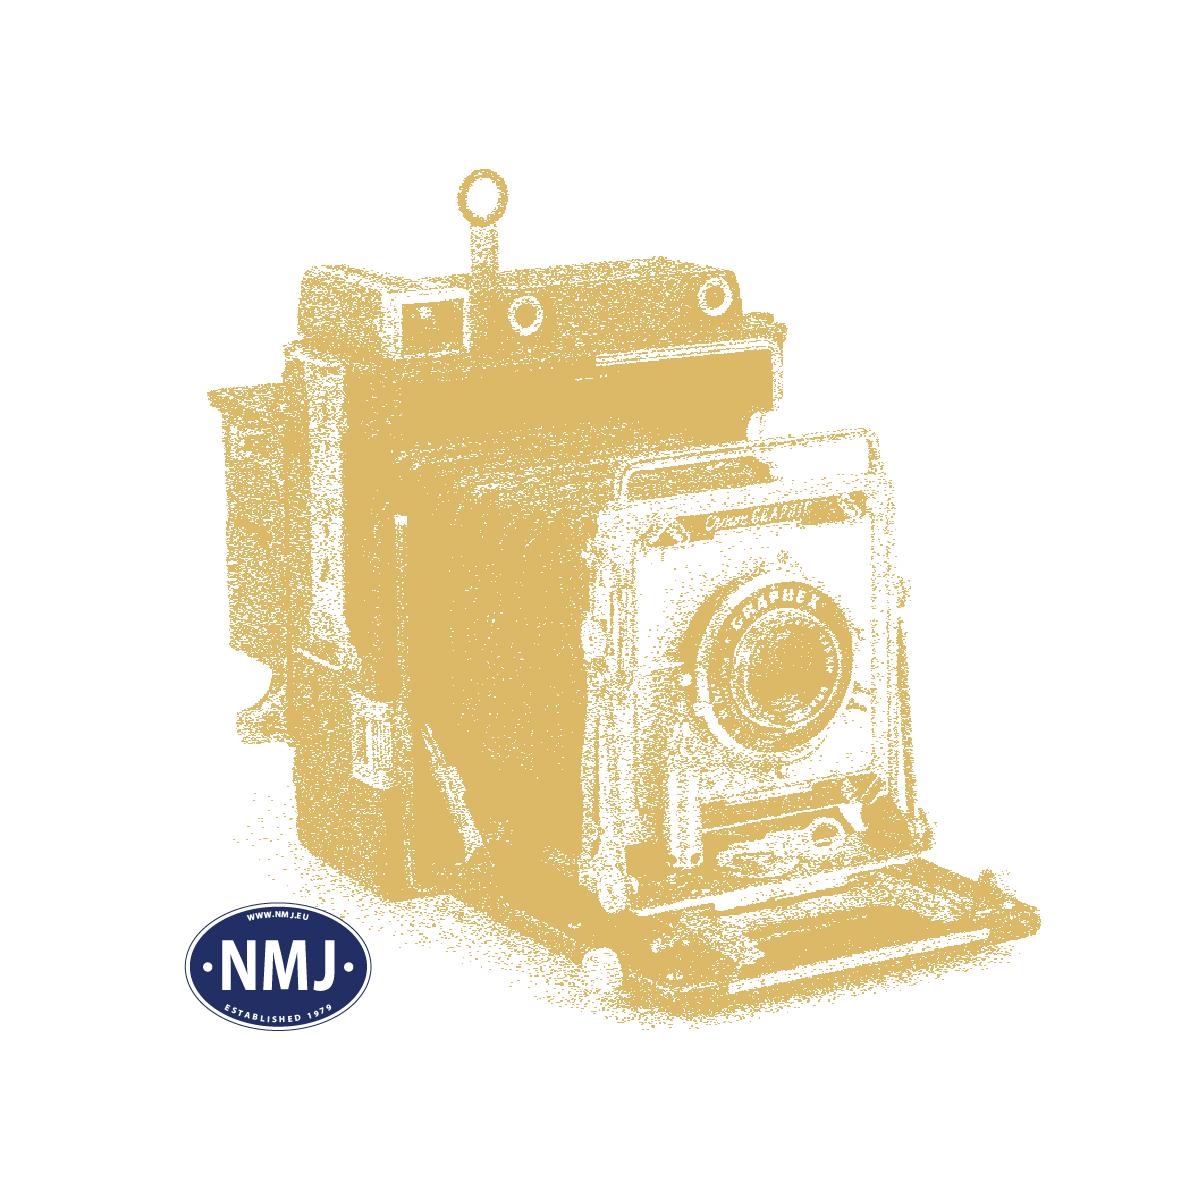 NMJT84.201 - NMJ Topline NSB BM69A.04, rotbraun, DC